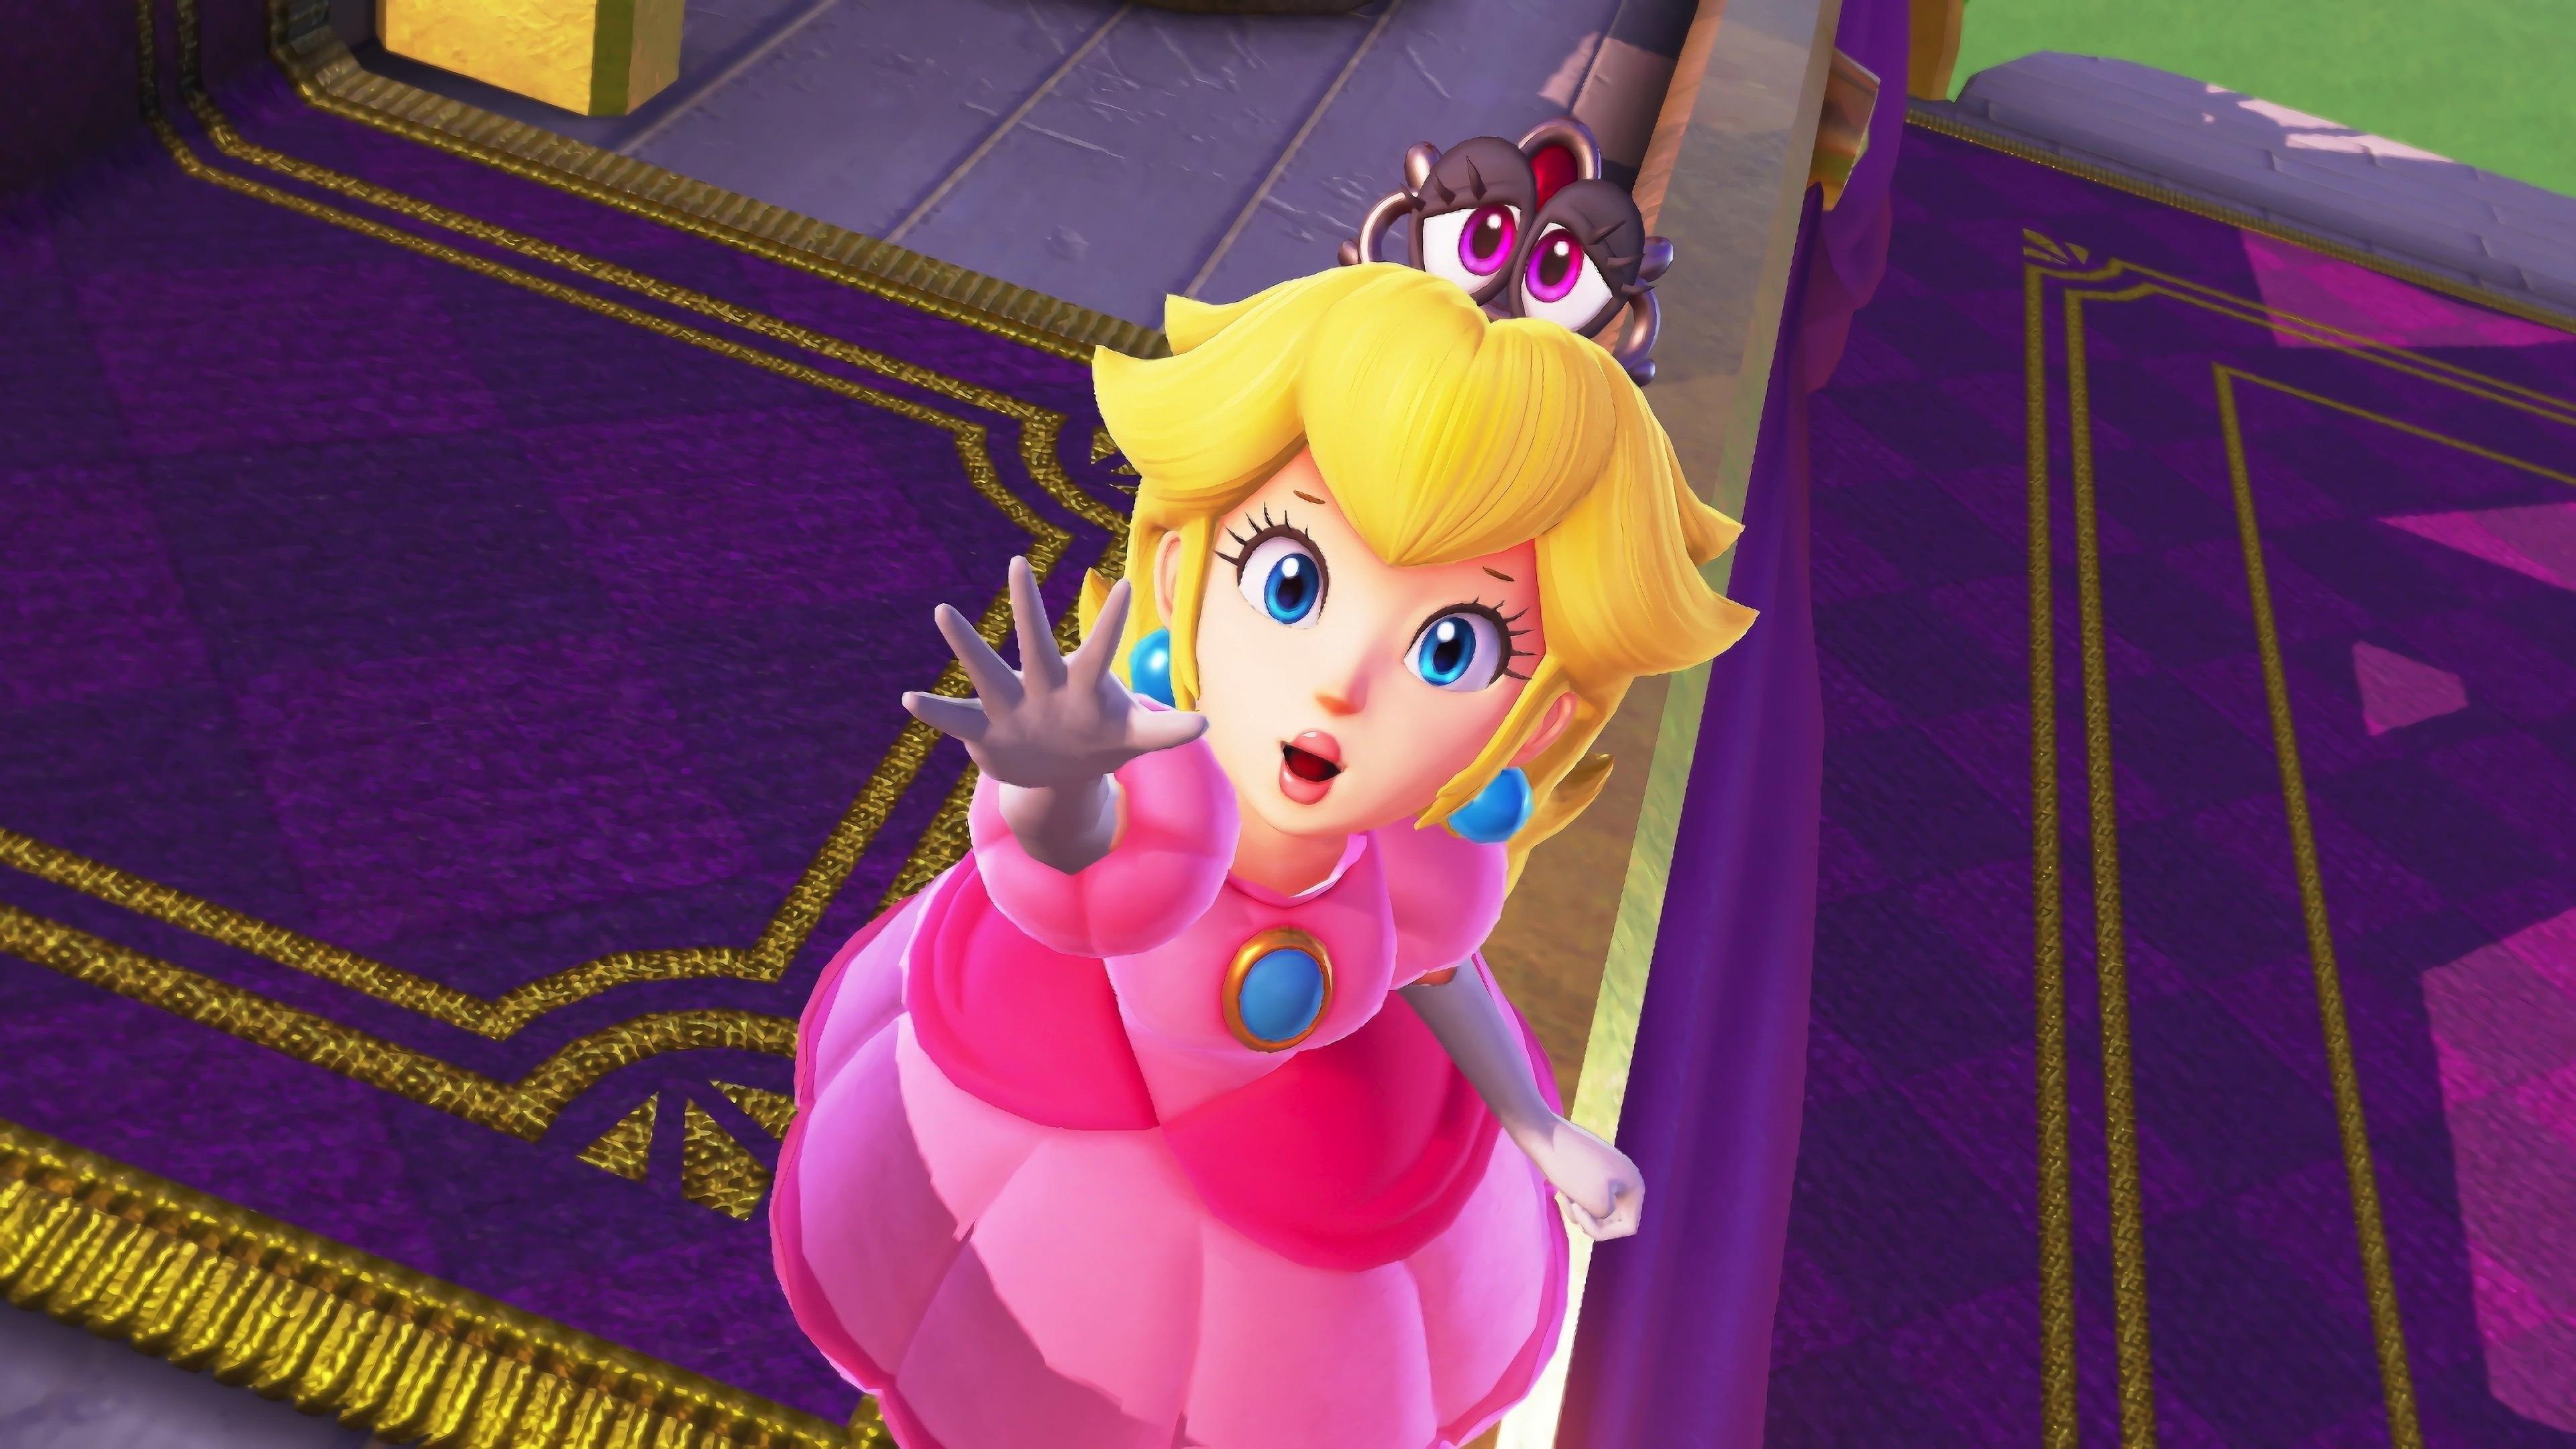 Download 3840x2400 Wallpaper Blonde Princess Super Mario Odyssey